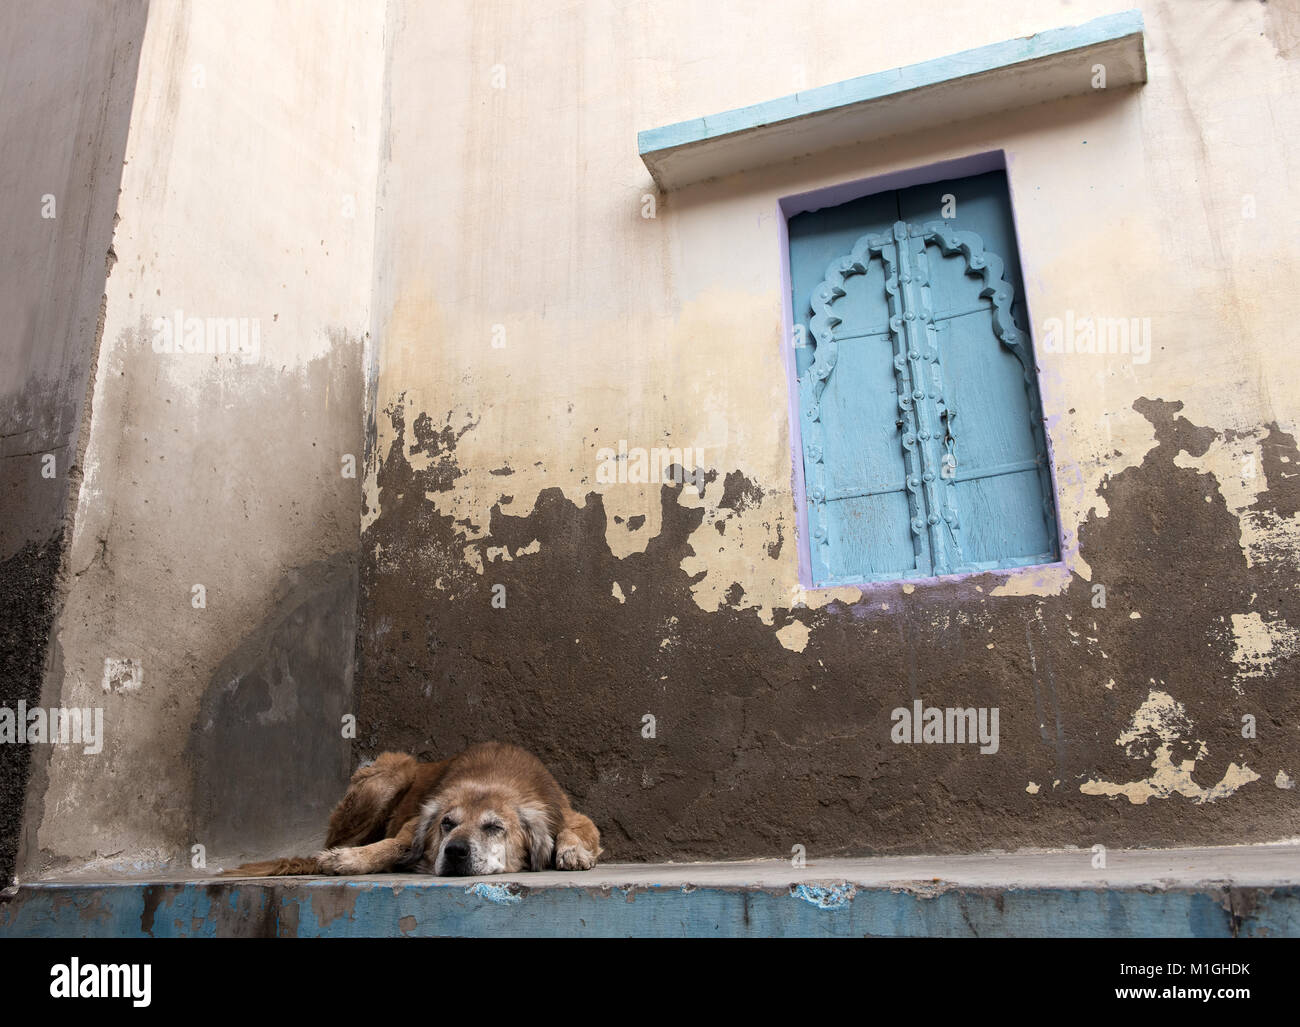 Abandoned homeless dog sleeping outside a house in Varanasi  India. - Stock Image